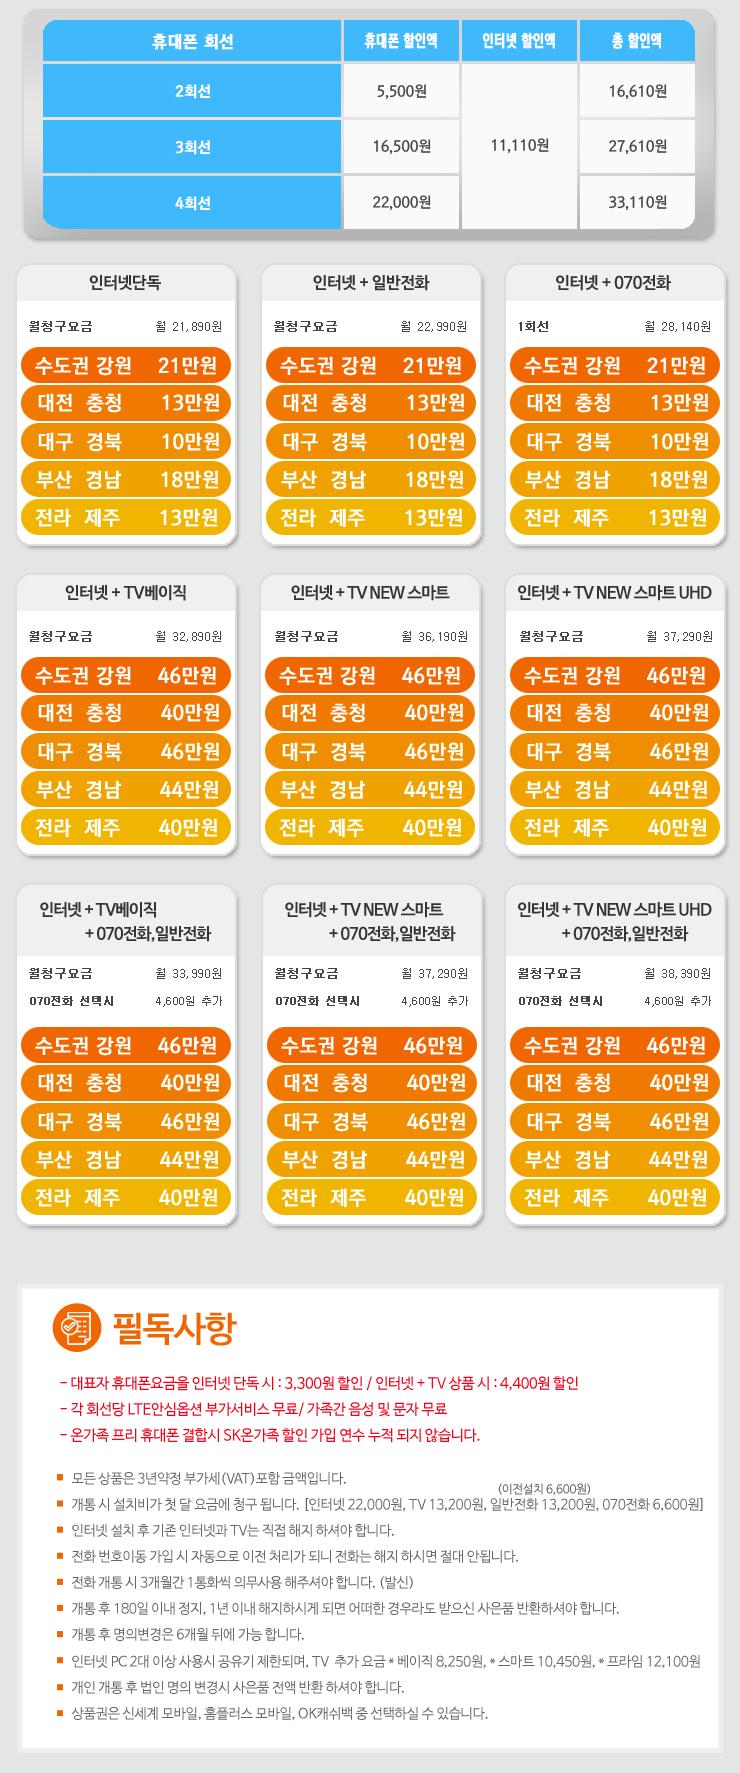 SK_broadband_plan_500m_740.png